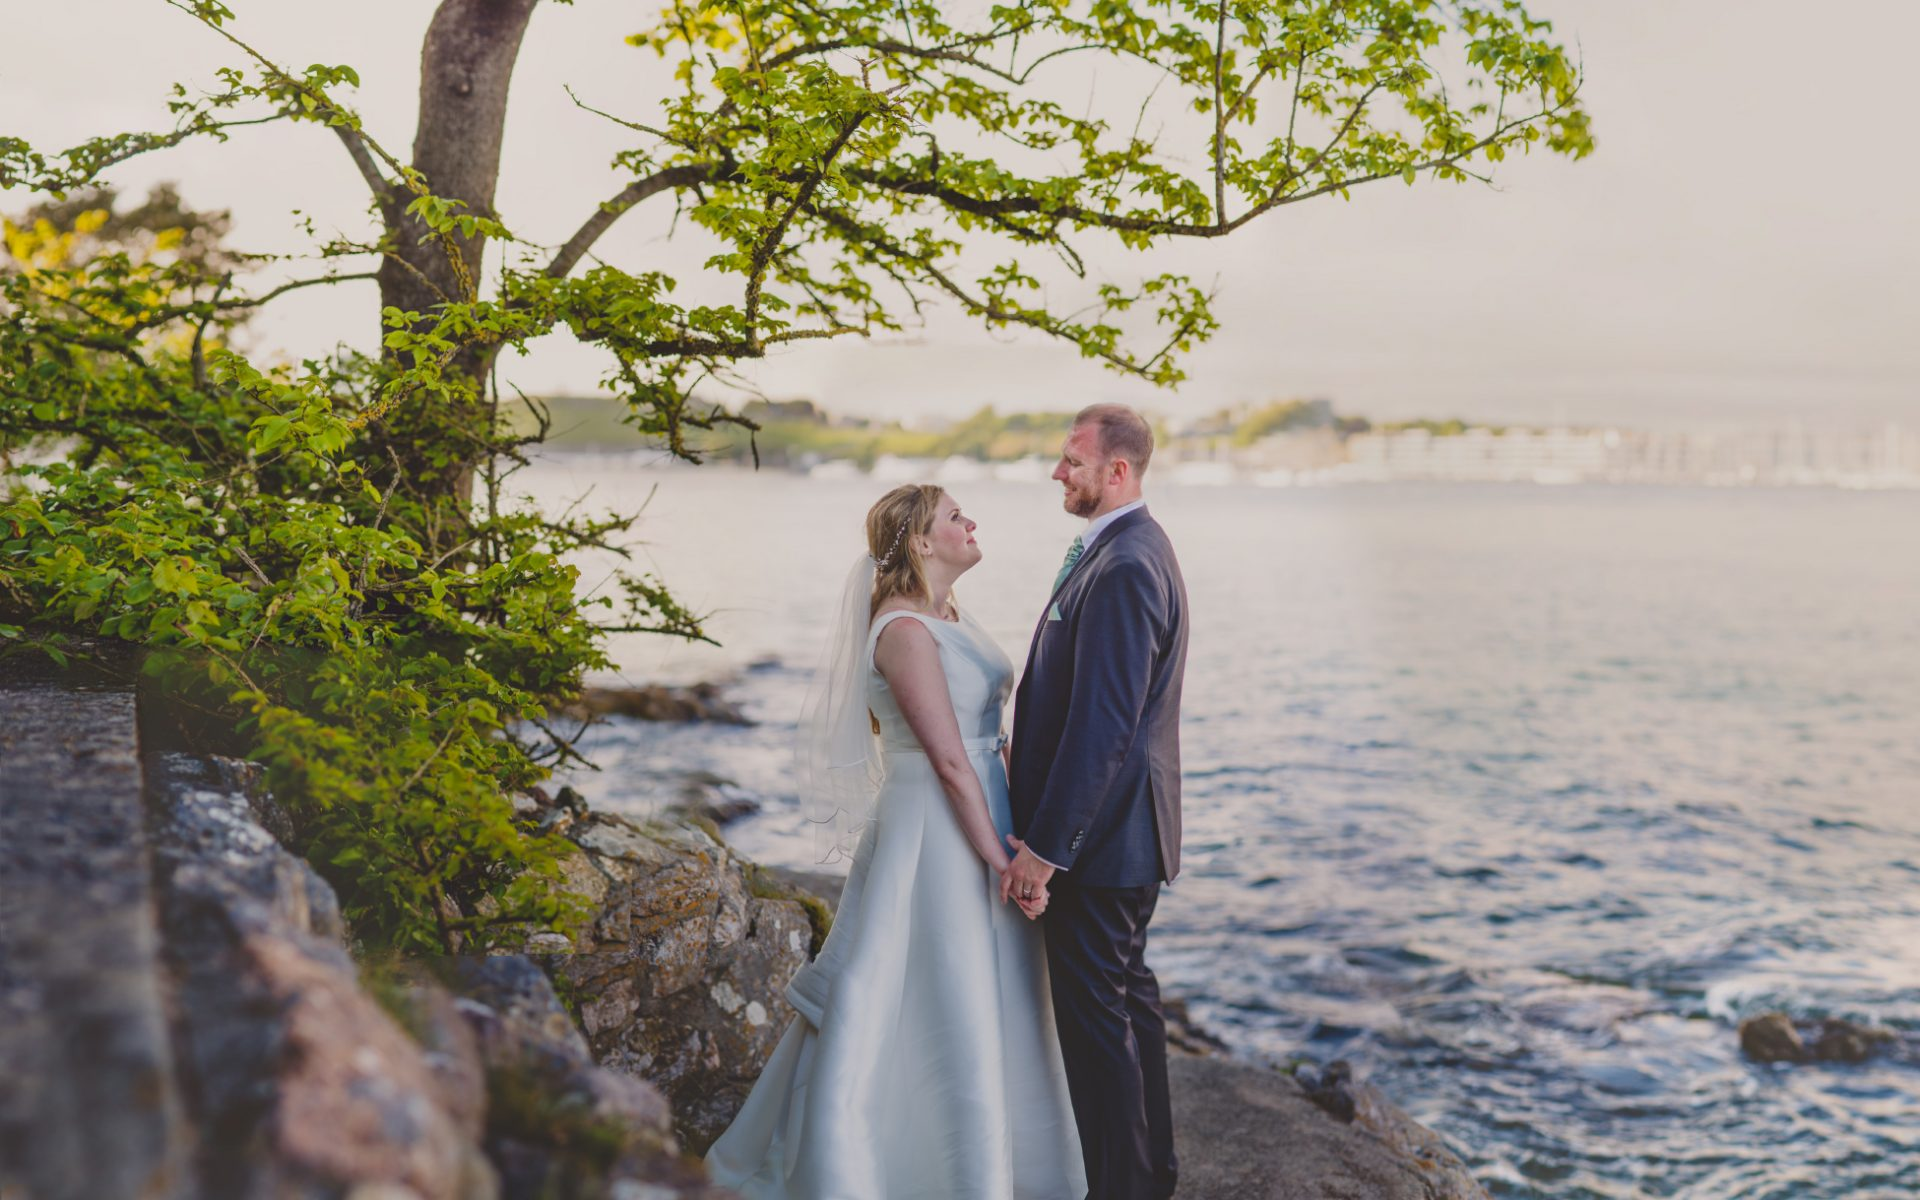 Wedding Photographer Cornwall - Catrin & John Mount Edcumbe Wedding